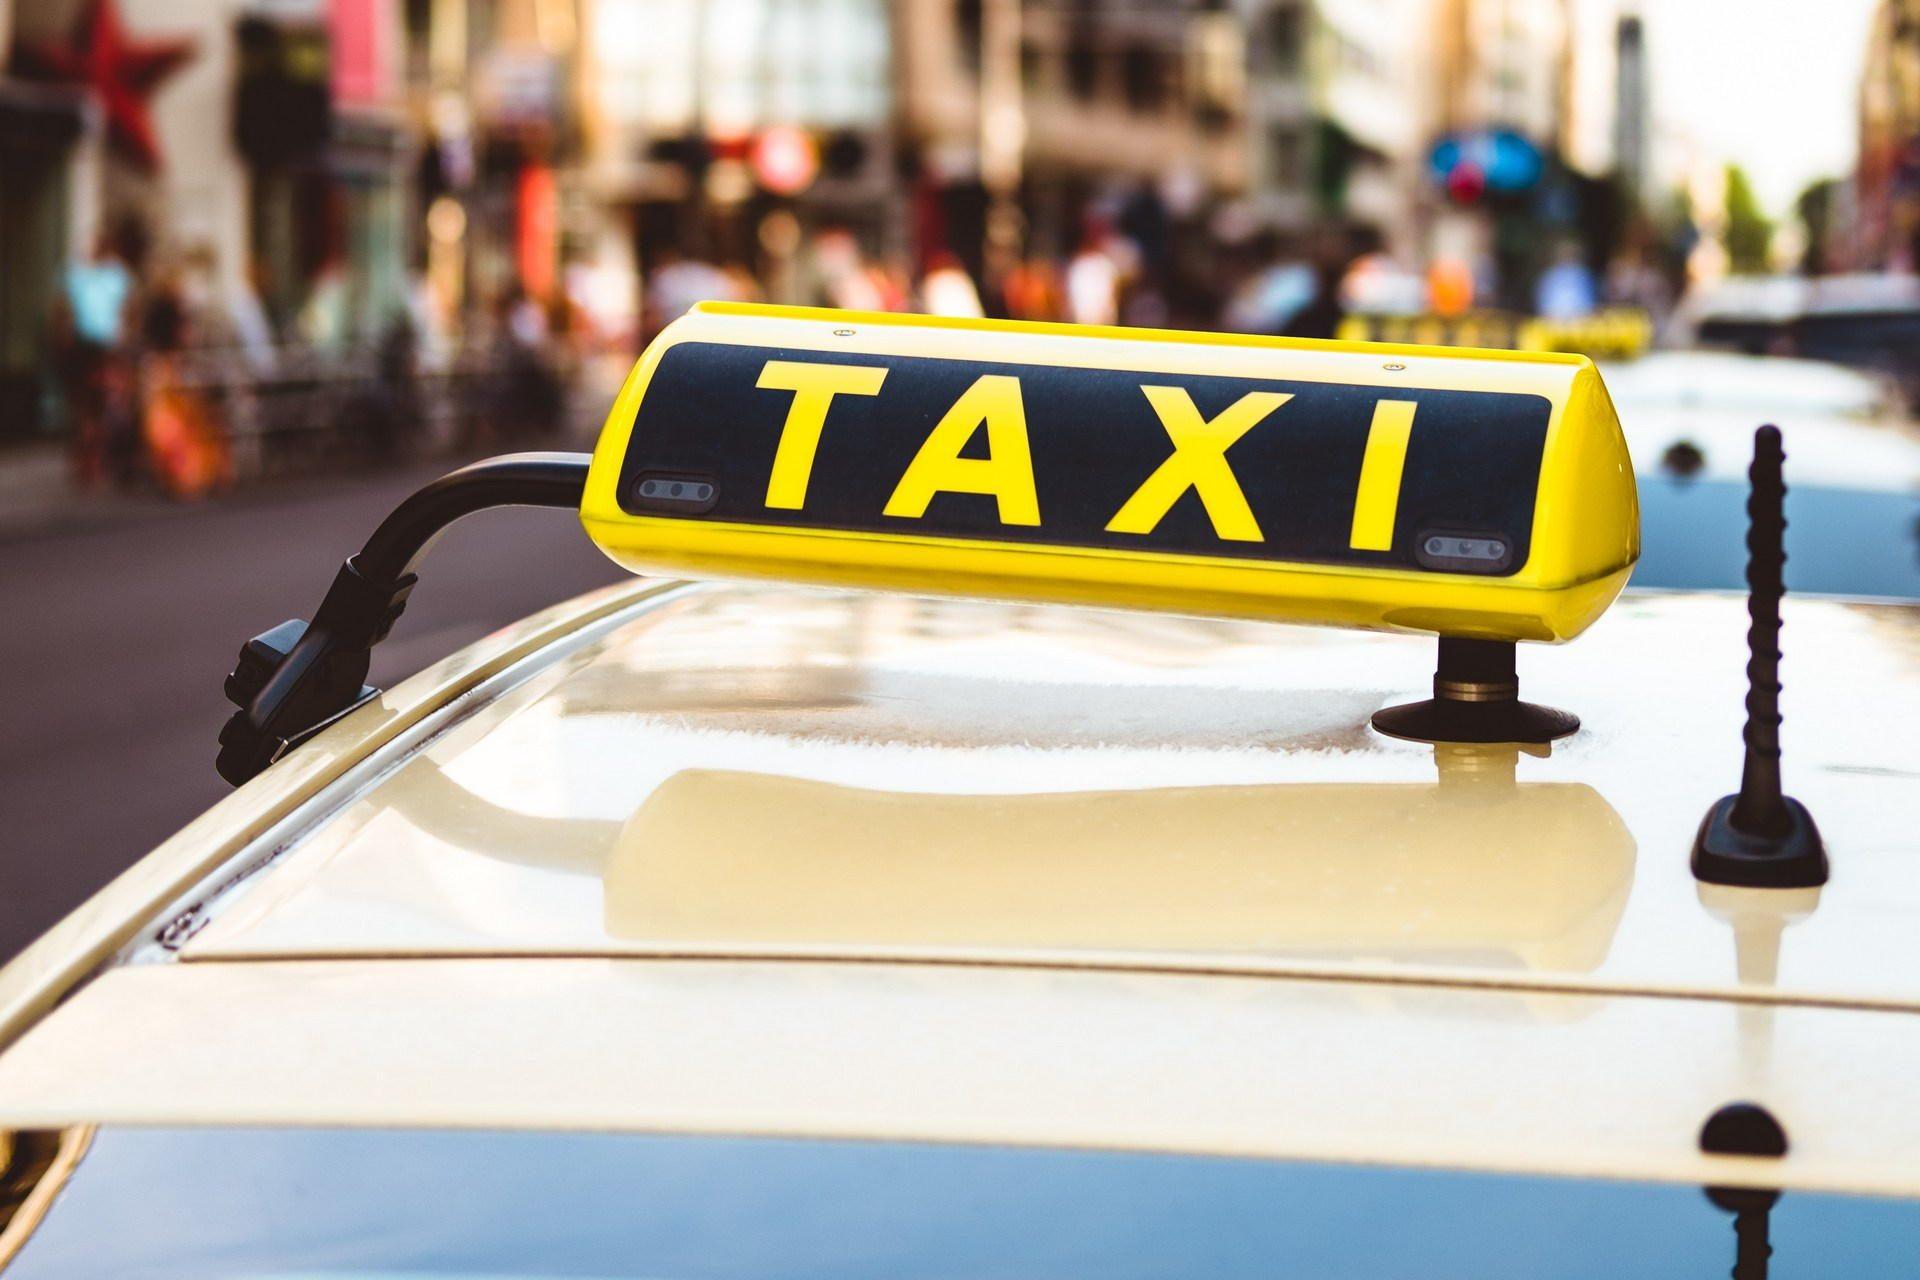 Uber under federal investigation for alleged gender pay gap, report says